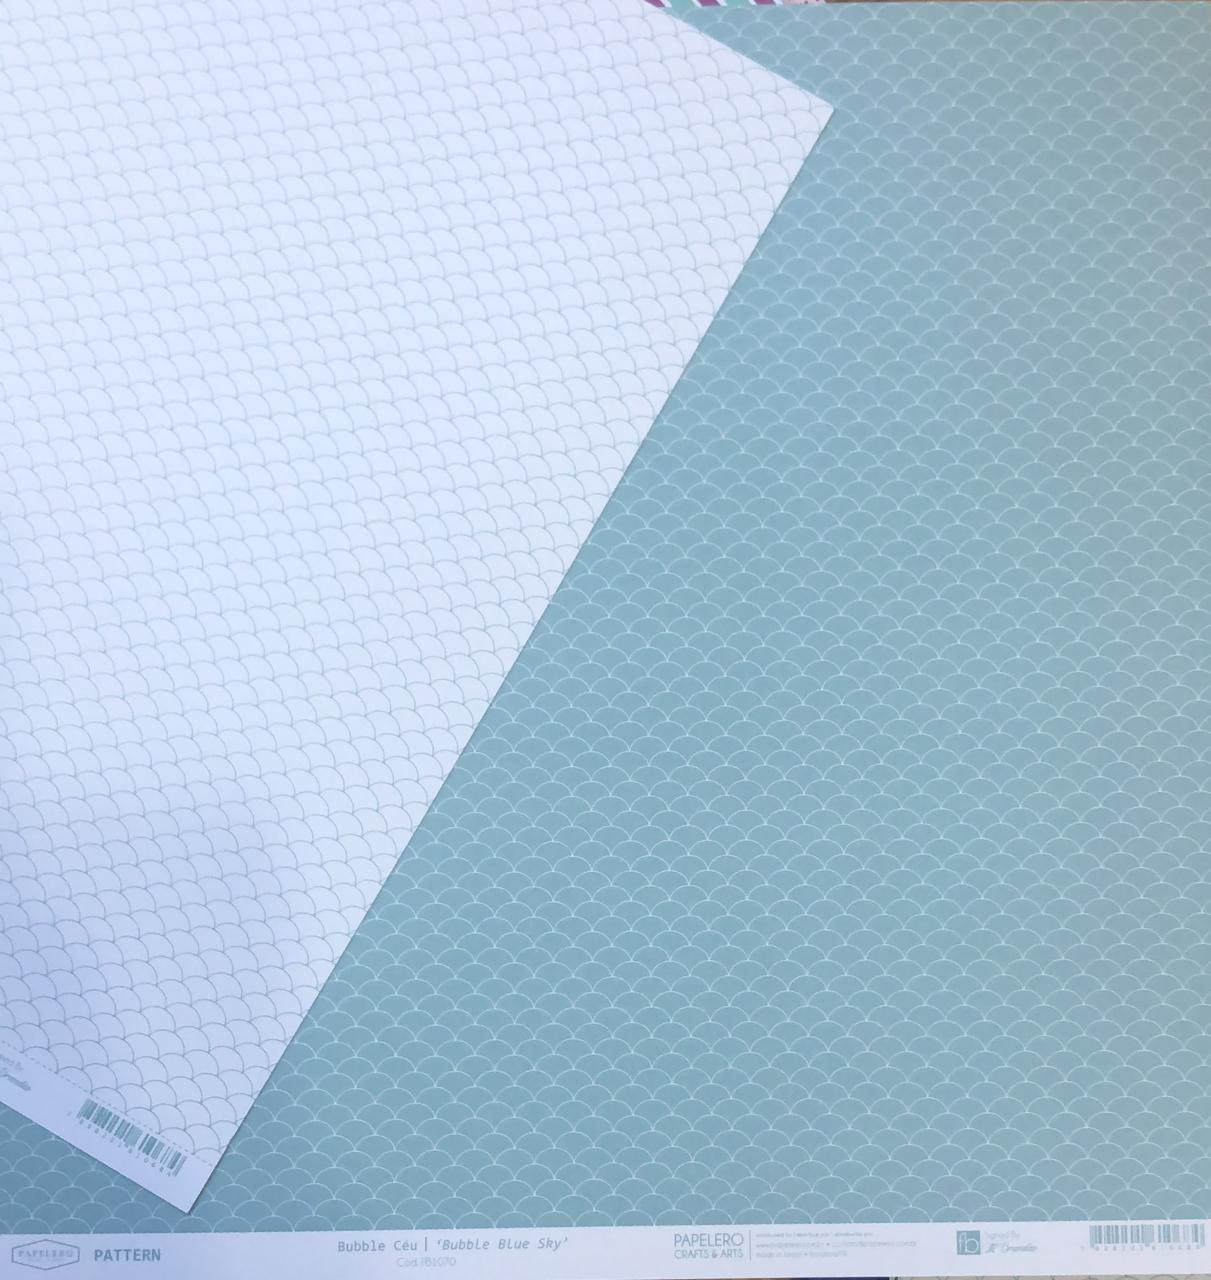 Papel Scrap - Bubble Céu - Coleção Pattern - Papelero (FB1070)